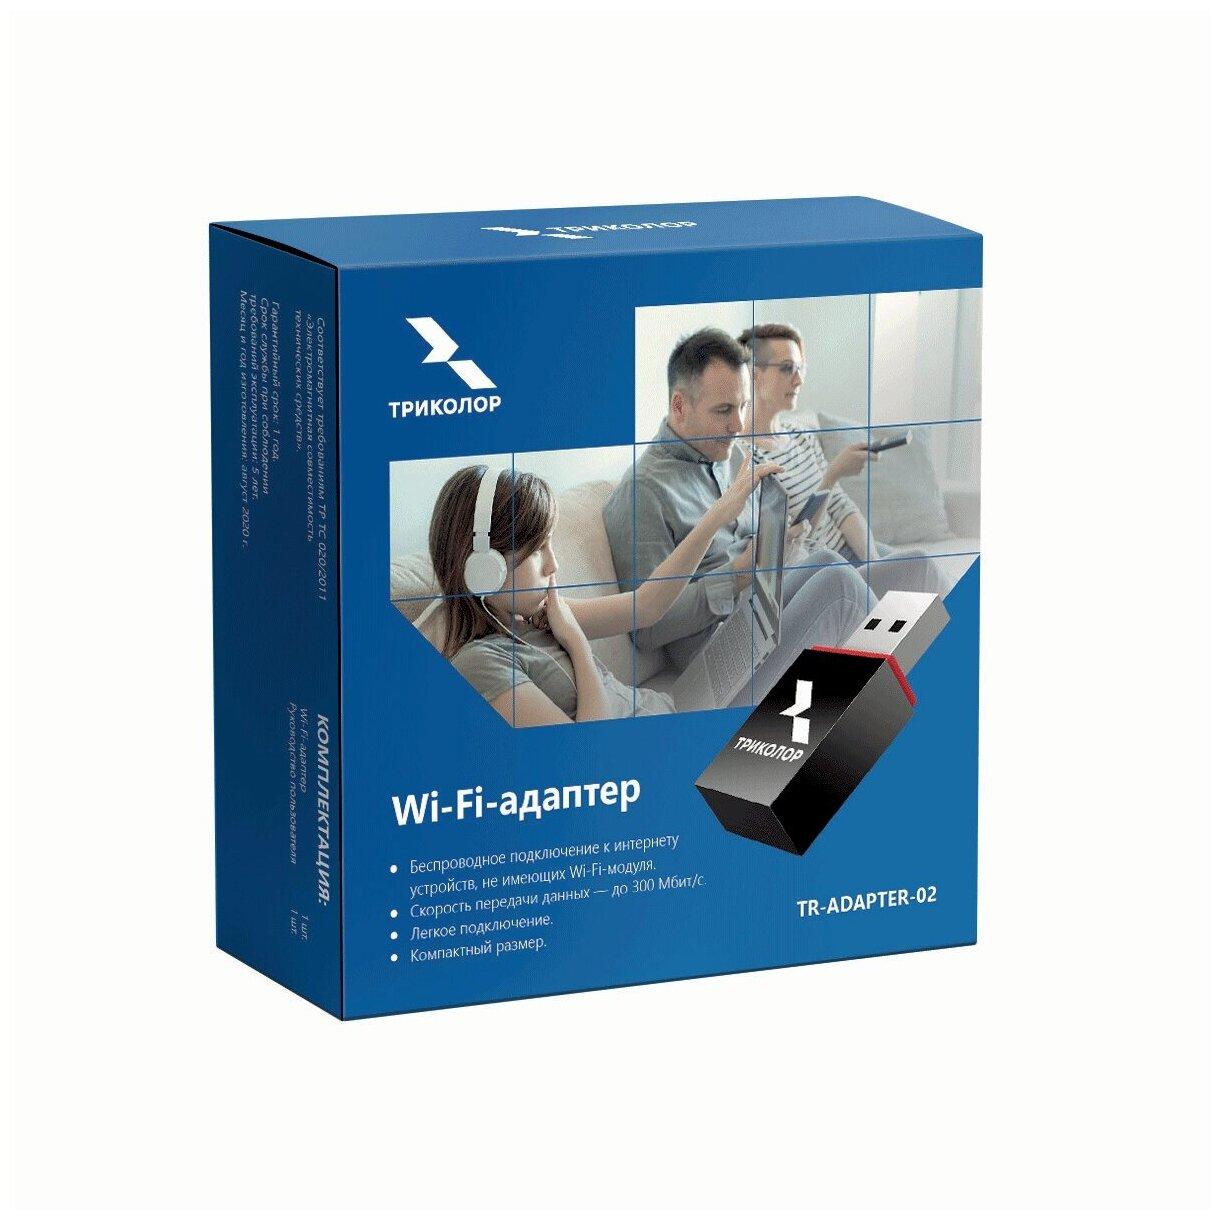 Адаптер Wi-Fi Триколор, TR-adapter-02 — купить по выгодной цене на Яндекс.Маркете